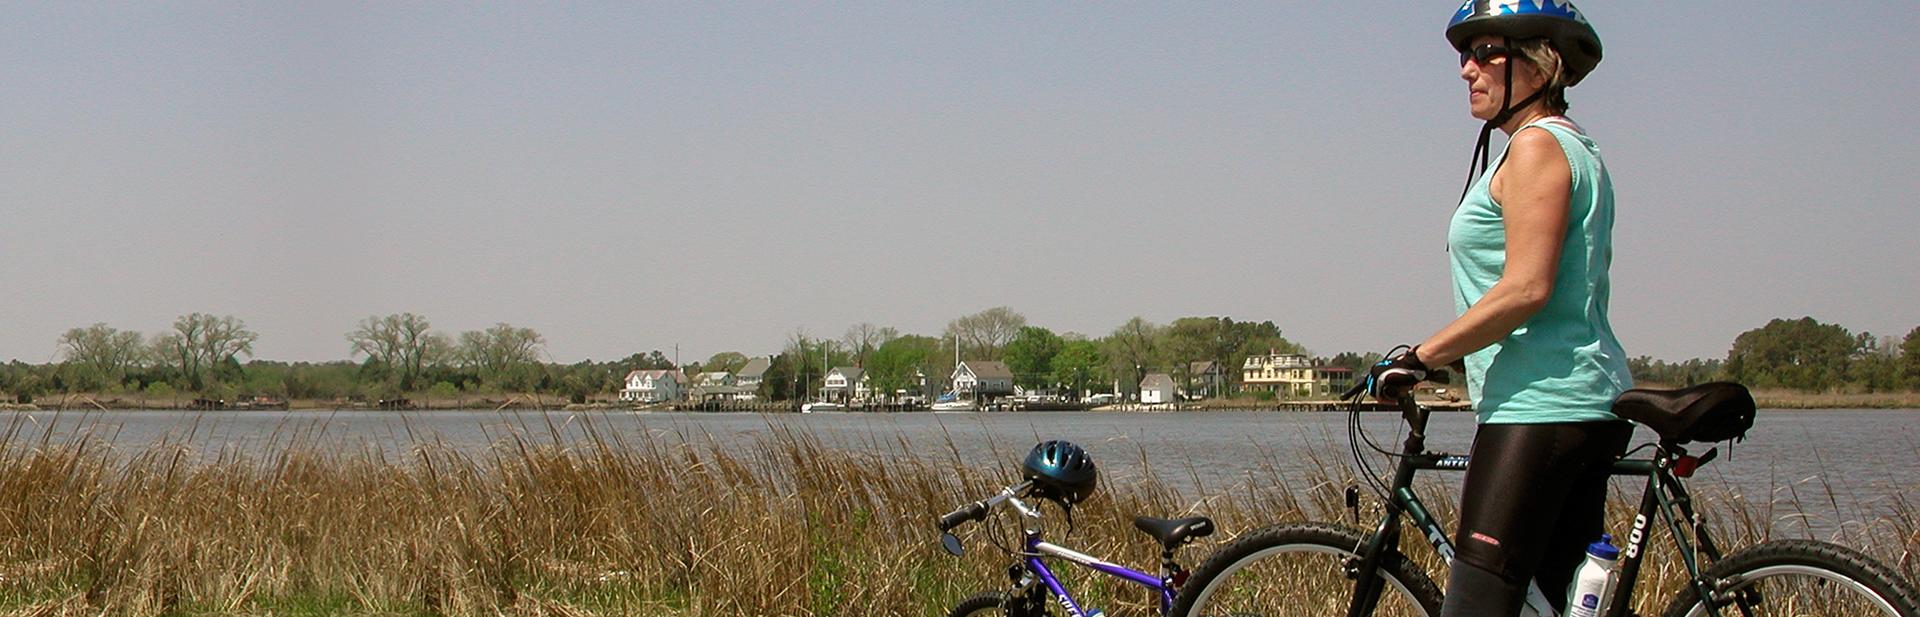 Somerset County, MD - Biking